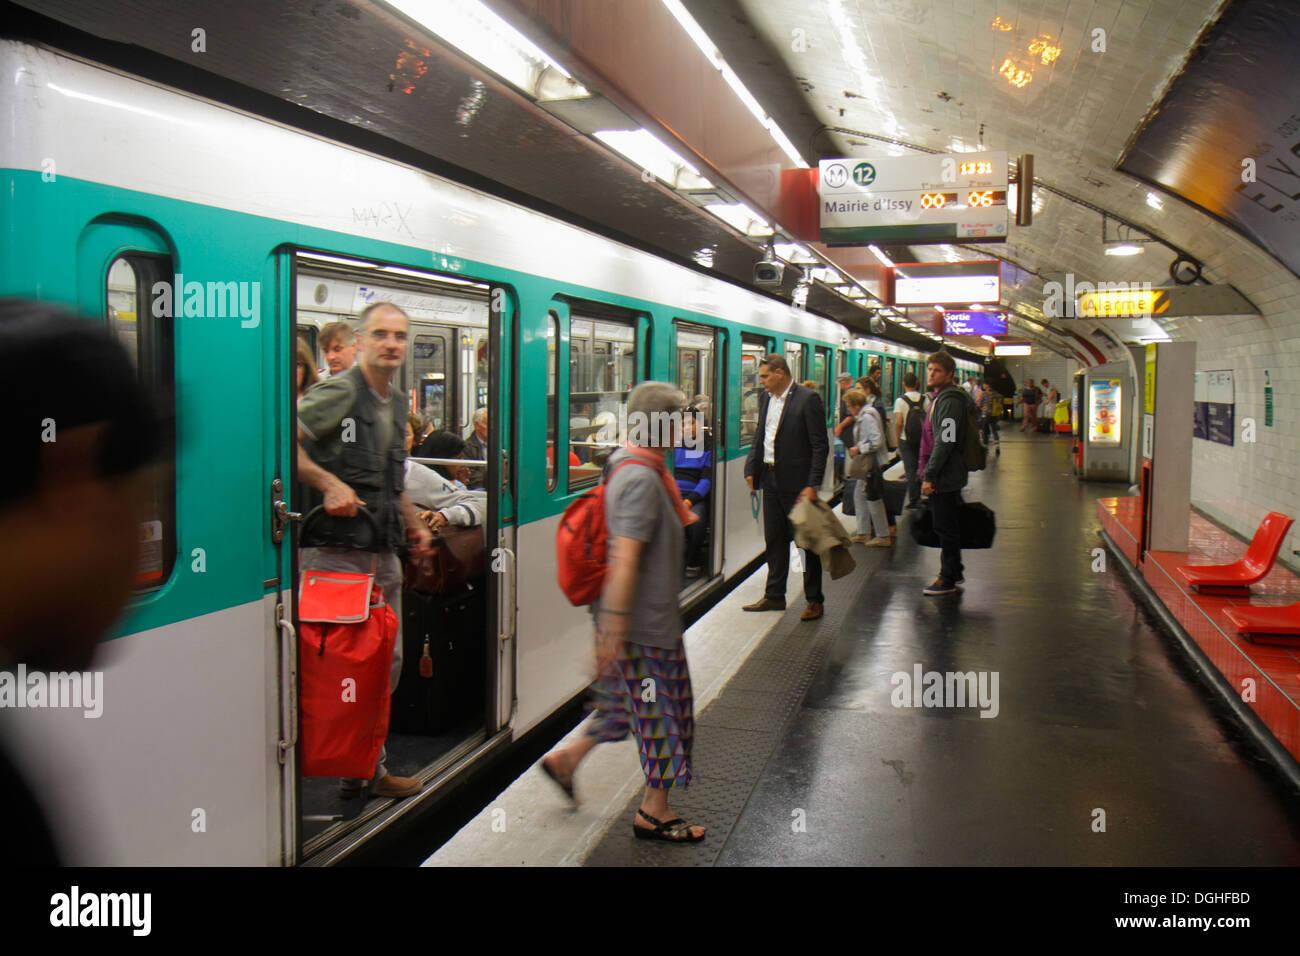 Paris France Europe French 8th arrondissement Madeleine Metro Station Line 8 12 14 subway public transportation Stock Photo